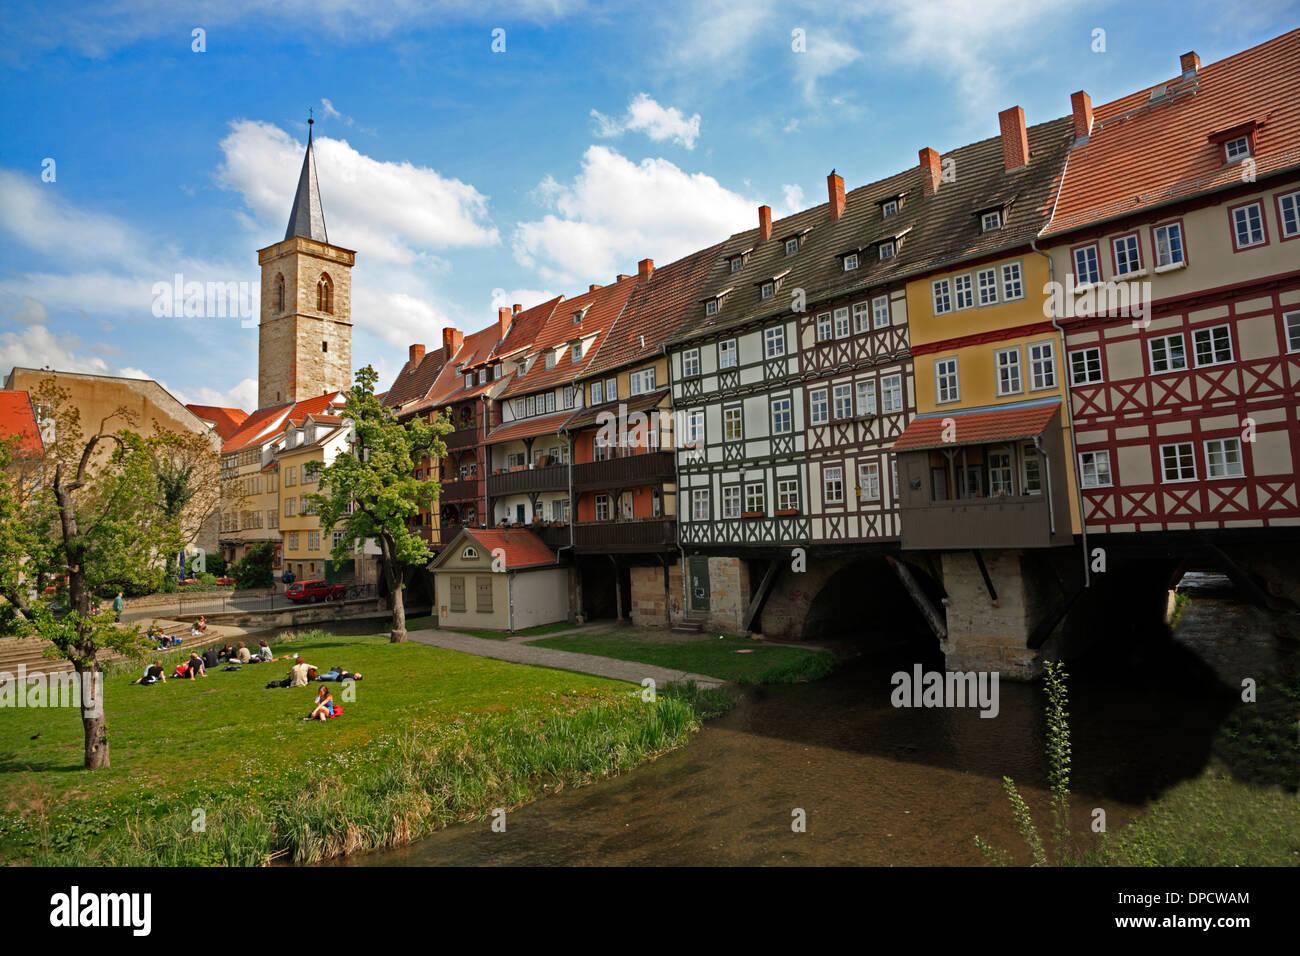 Kraemerbruecke, Merchants bridge across Gera river, Erfurt, Thuringia, Germany, Europe - Stock Image